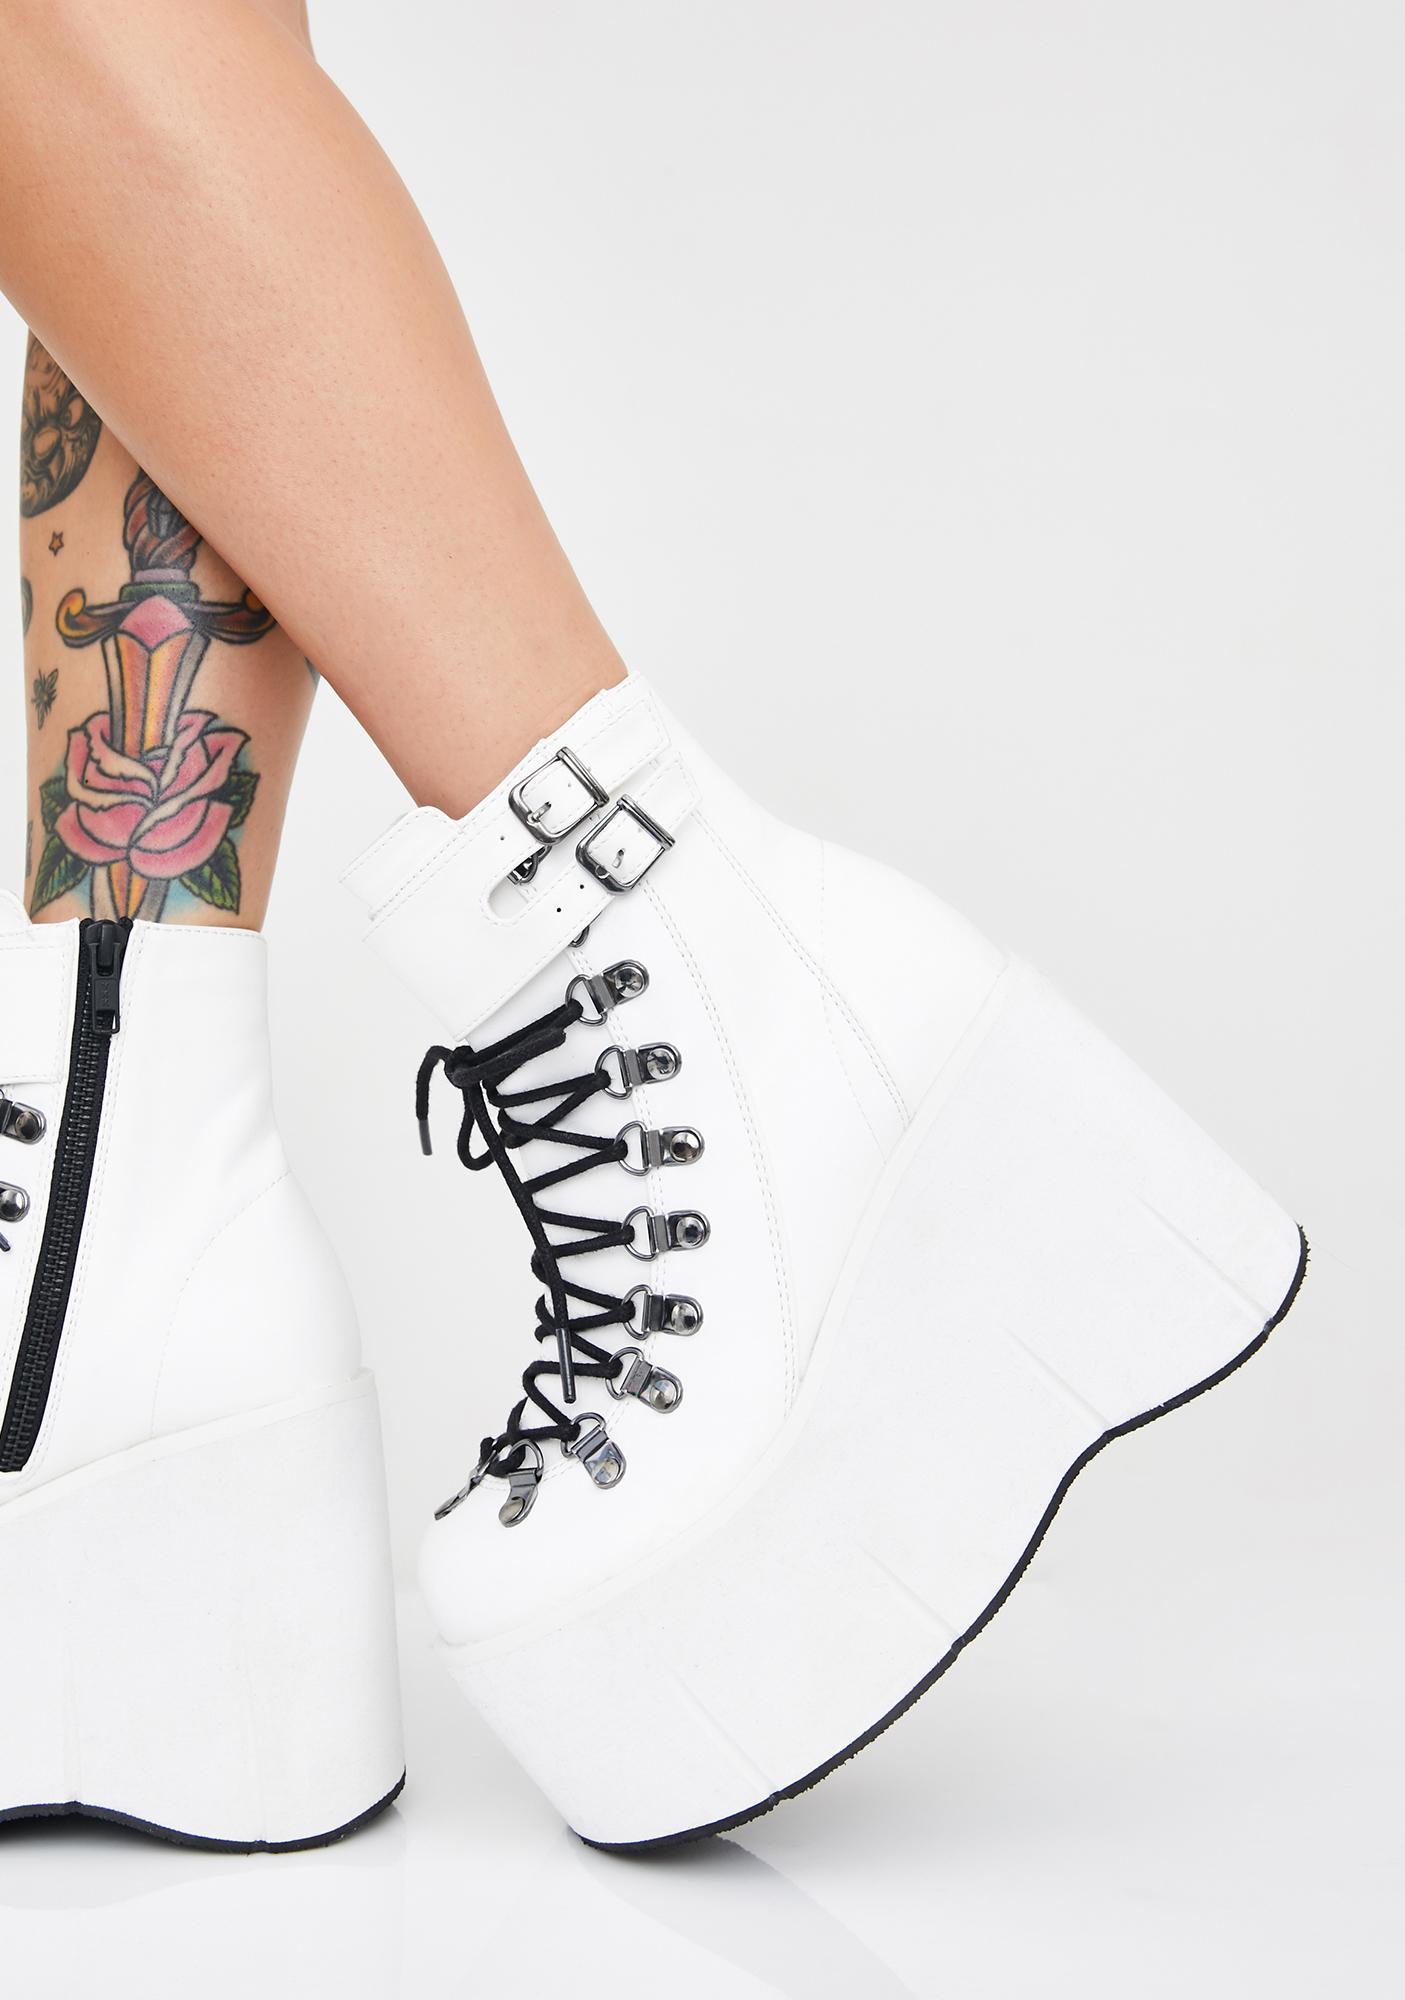 Demonia Pure Kera Lace-Up Platform Boots